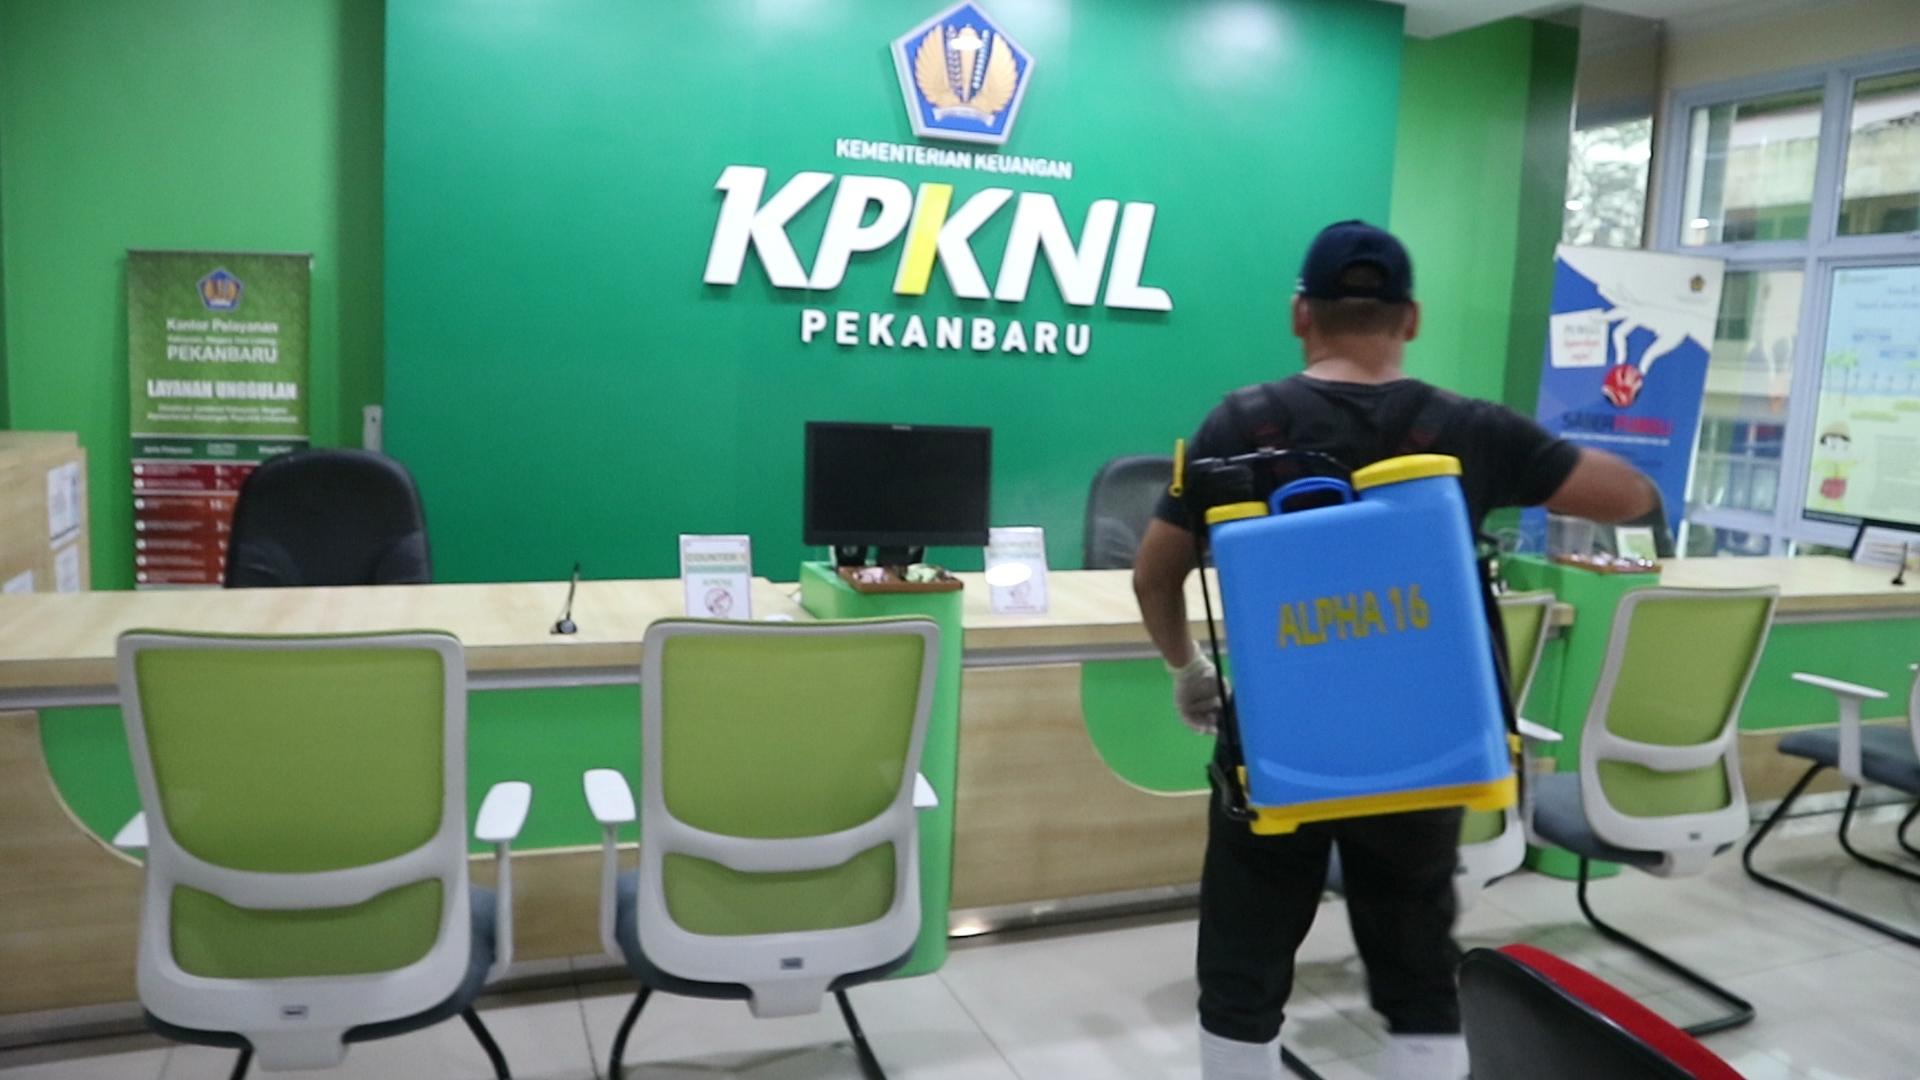 KPKNL Pekanbaru Cegah Penyebaran COVID-19